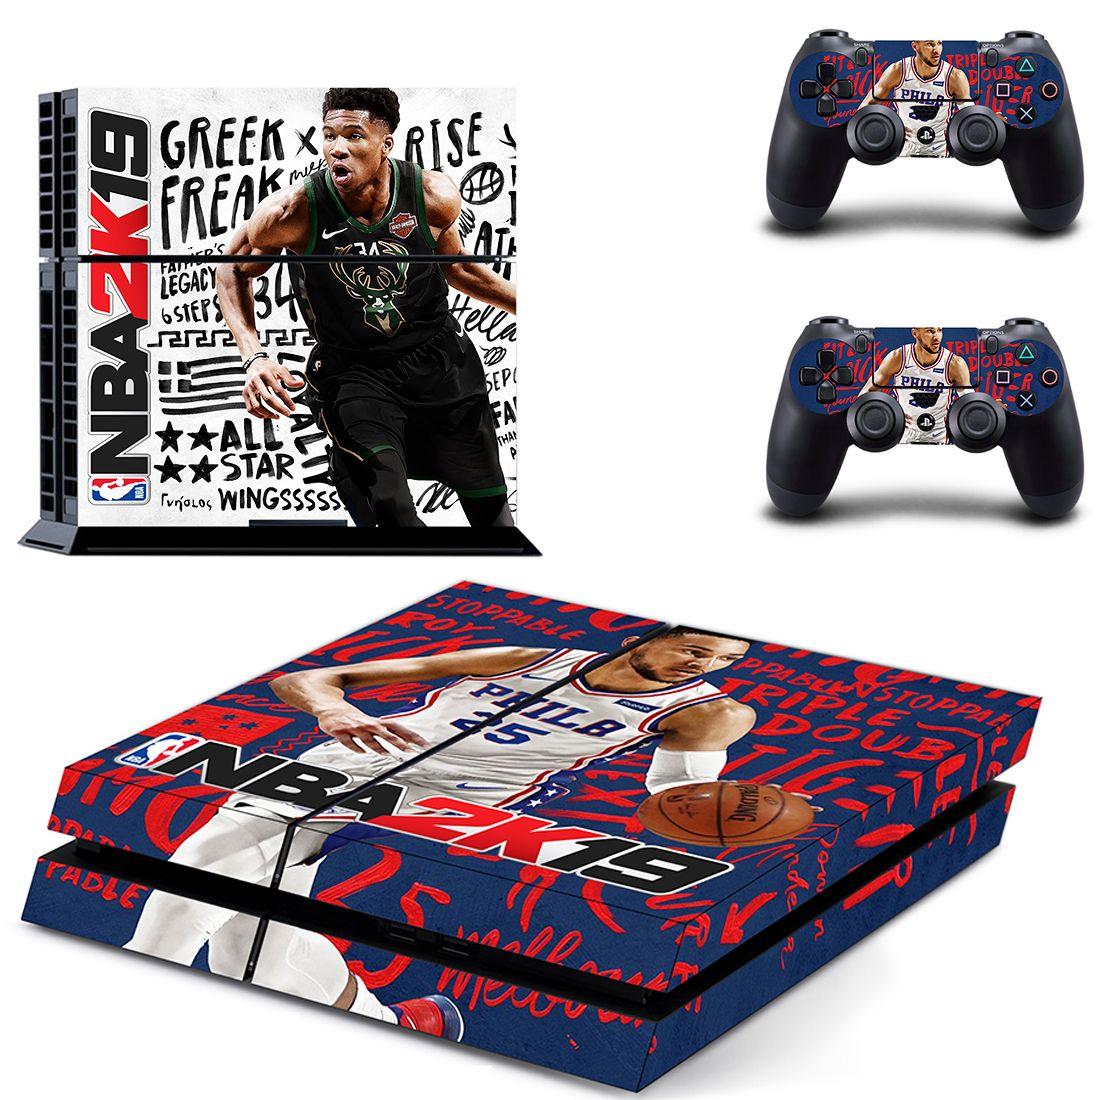 83fa7e674 NBA 2K19 Playstation PS4 Skin Stickers Free Shipping – DjTrading Ps4 Skins